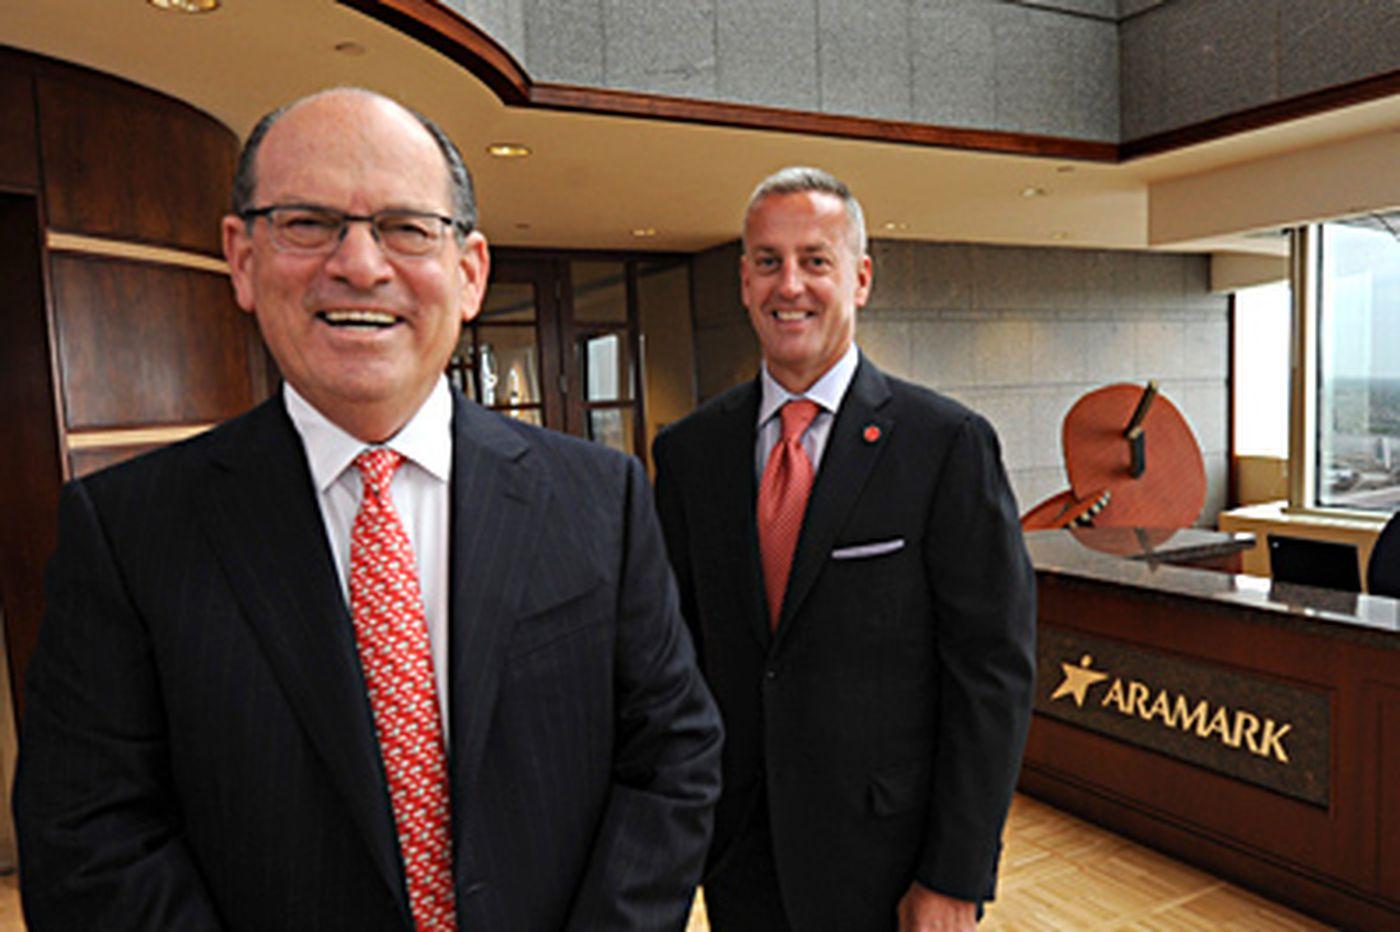 Foss to replace Neubauer as Aramark chief executive